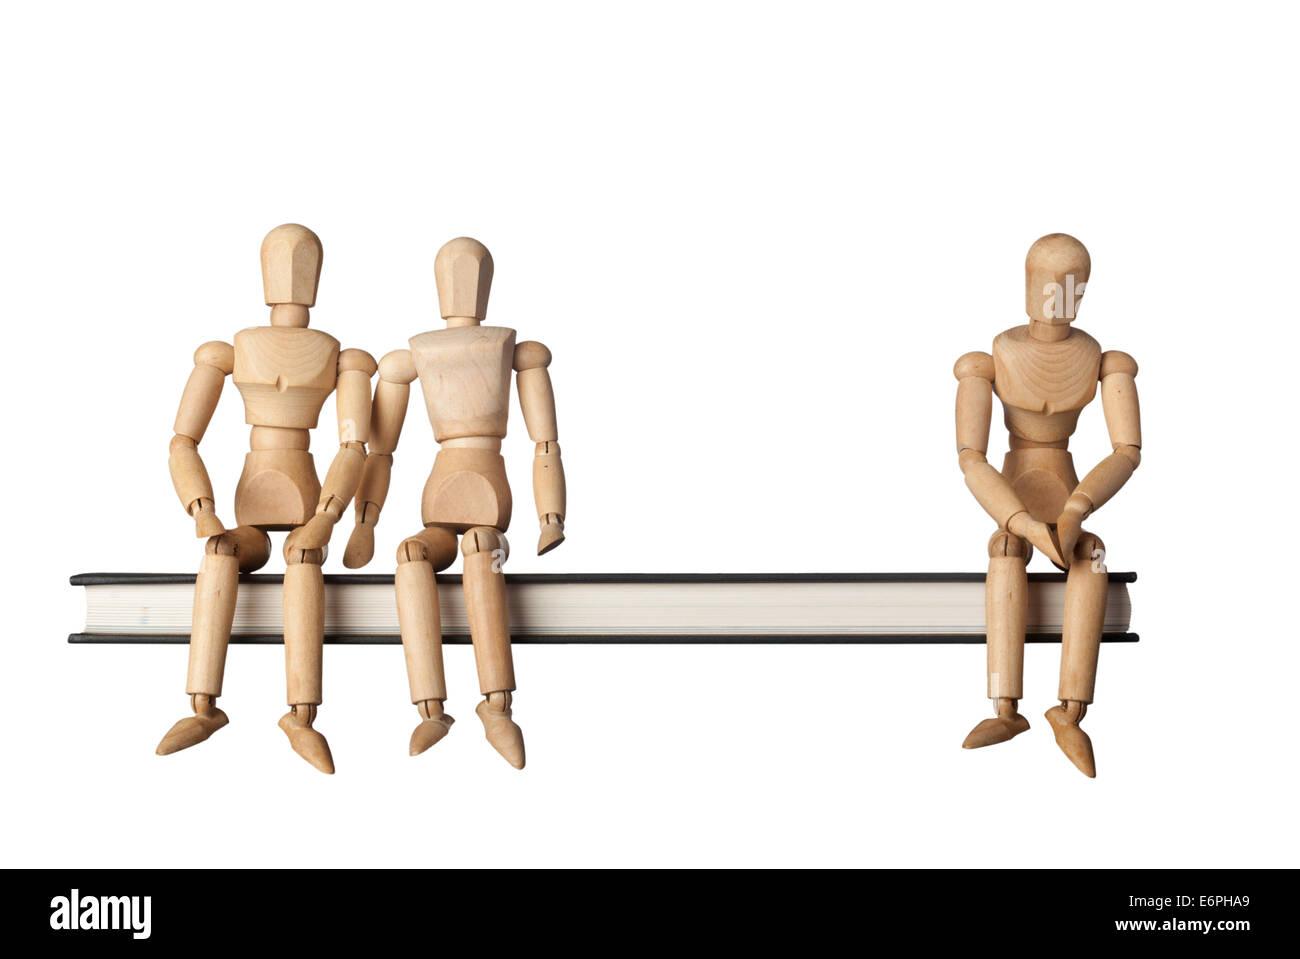 Relación entre tres personas representadas por tres figuras aisladas sobre fondo blanco. Imagen De Stock